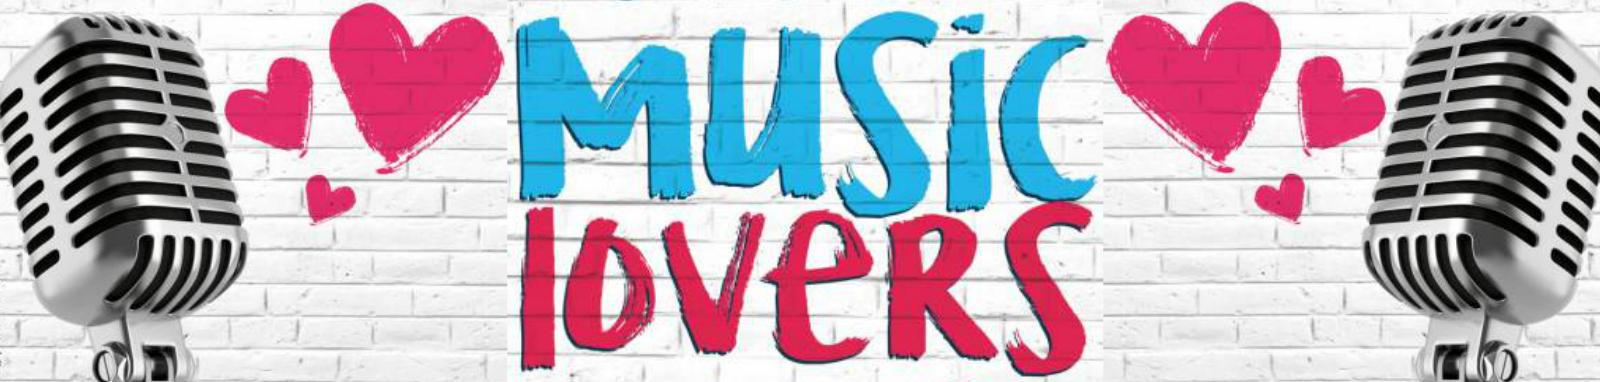 http://elrincondealexiaandbooks.blogspot.com.es/2016/10/resena-music-lovers-de-ines-diaz-arriero.html